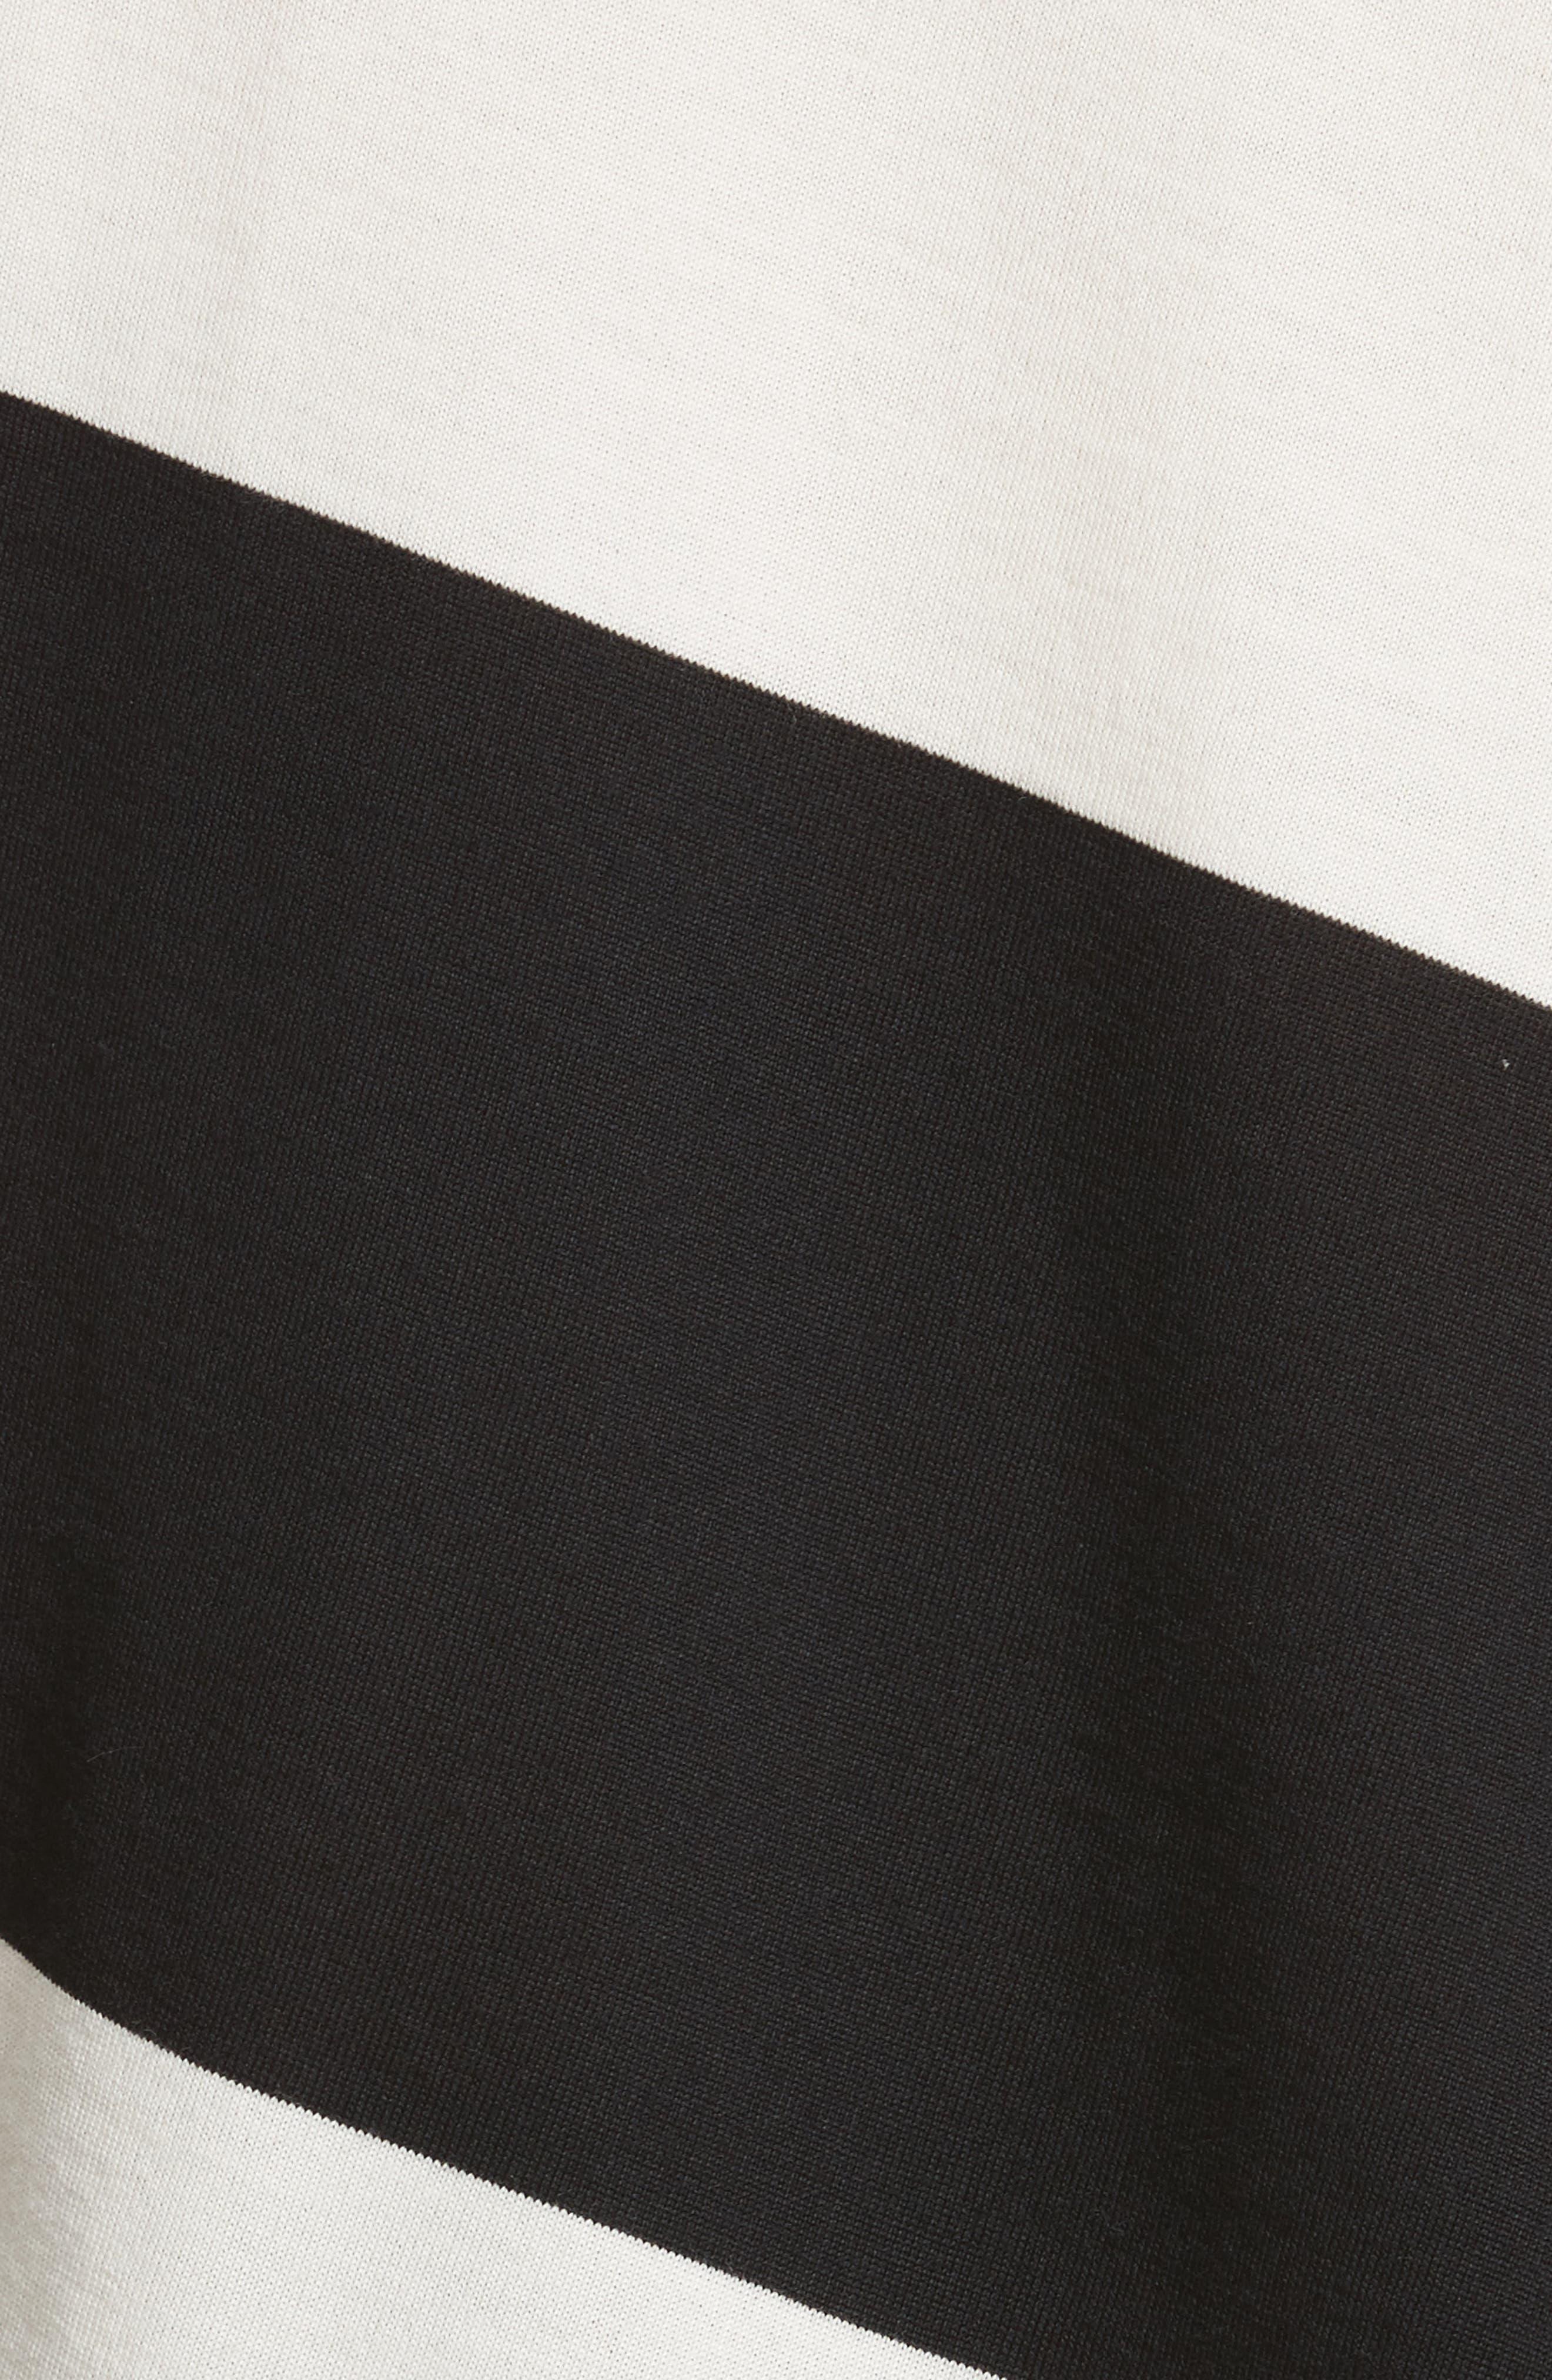 Bicolor Stripe Merino Wool Blend Sweater,                             Alternate thumbnail 5, color,                             001